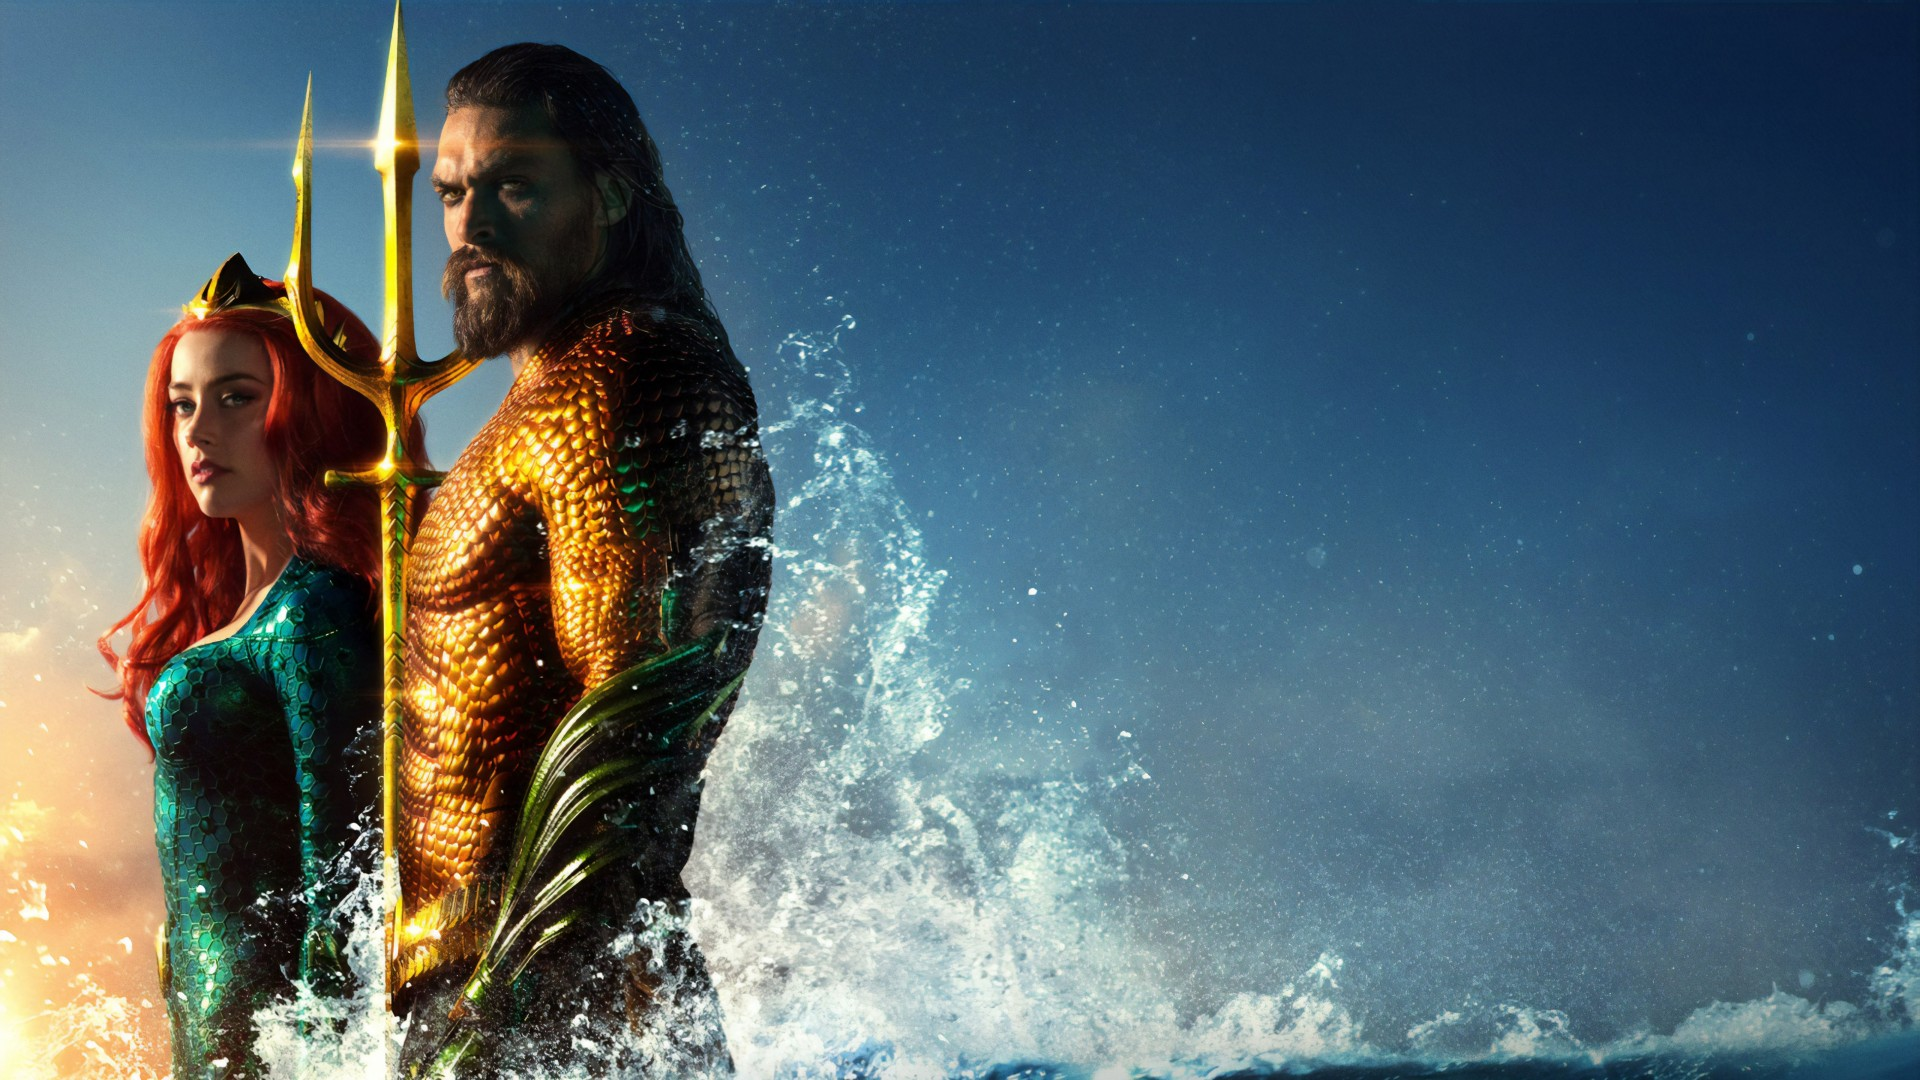 X Men Iphone Wallpaper Hd Mera Amp Aquaman In Aquaman 5k Wallpapers Hd Wallpapers